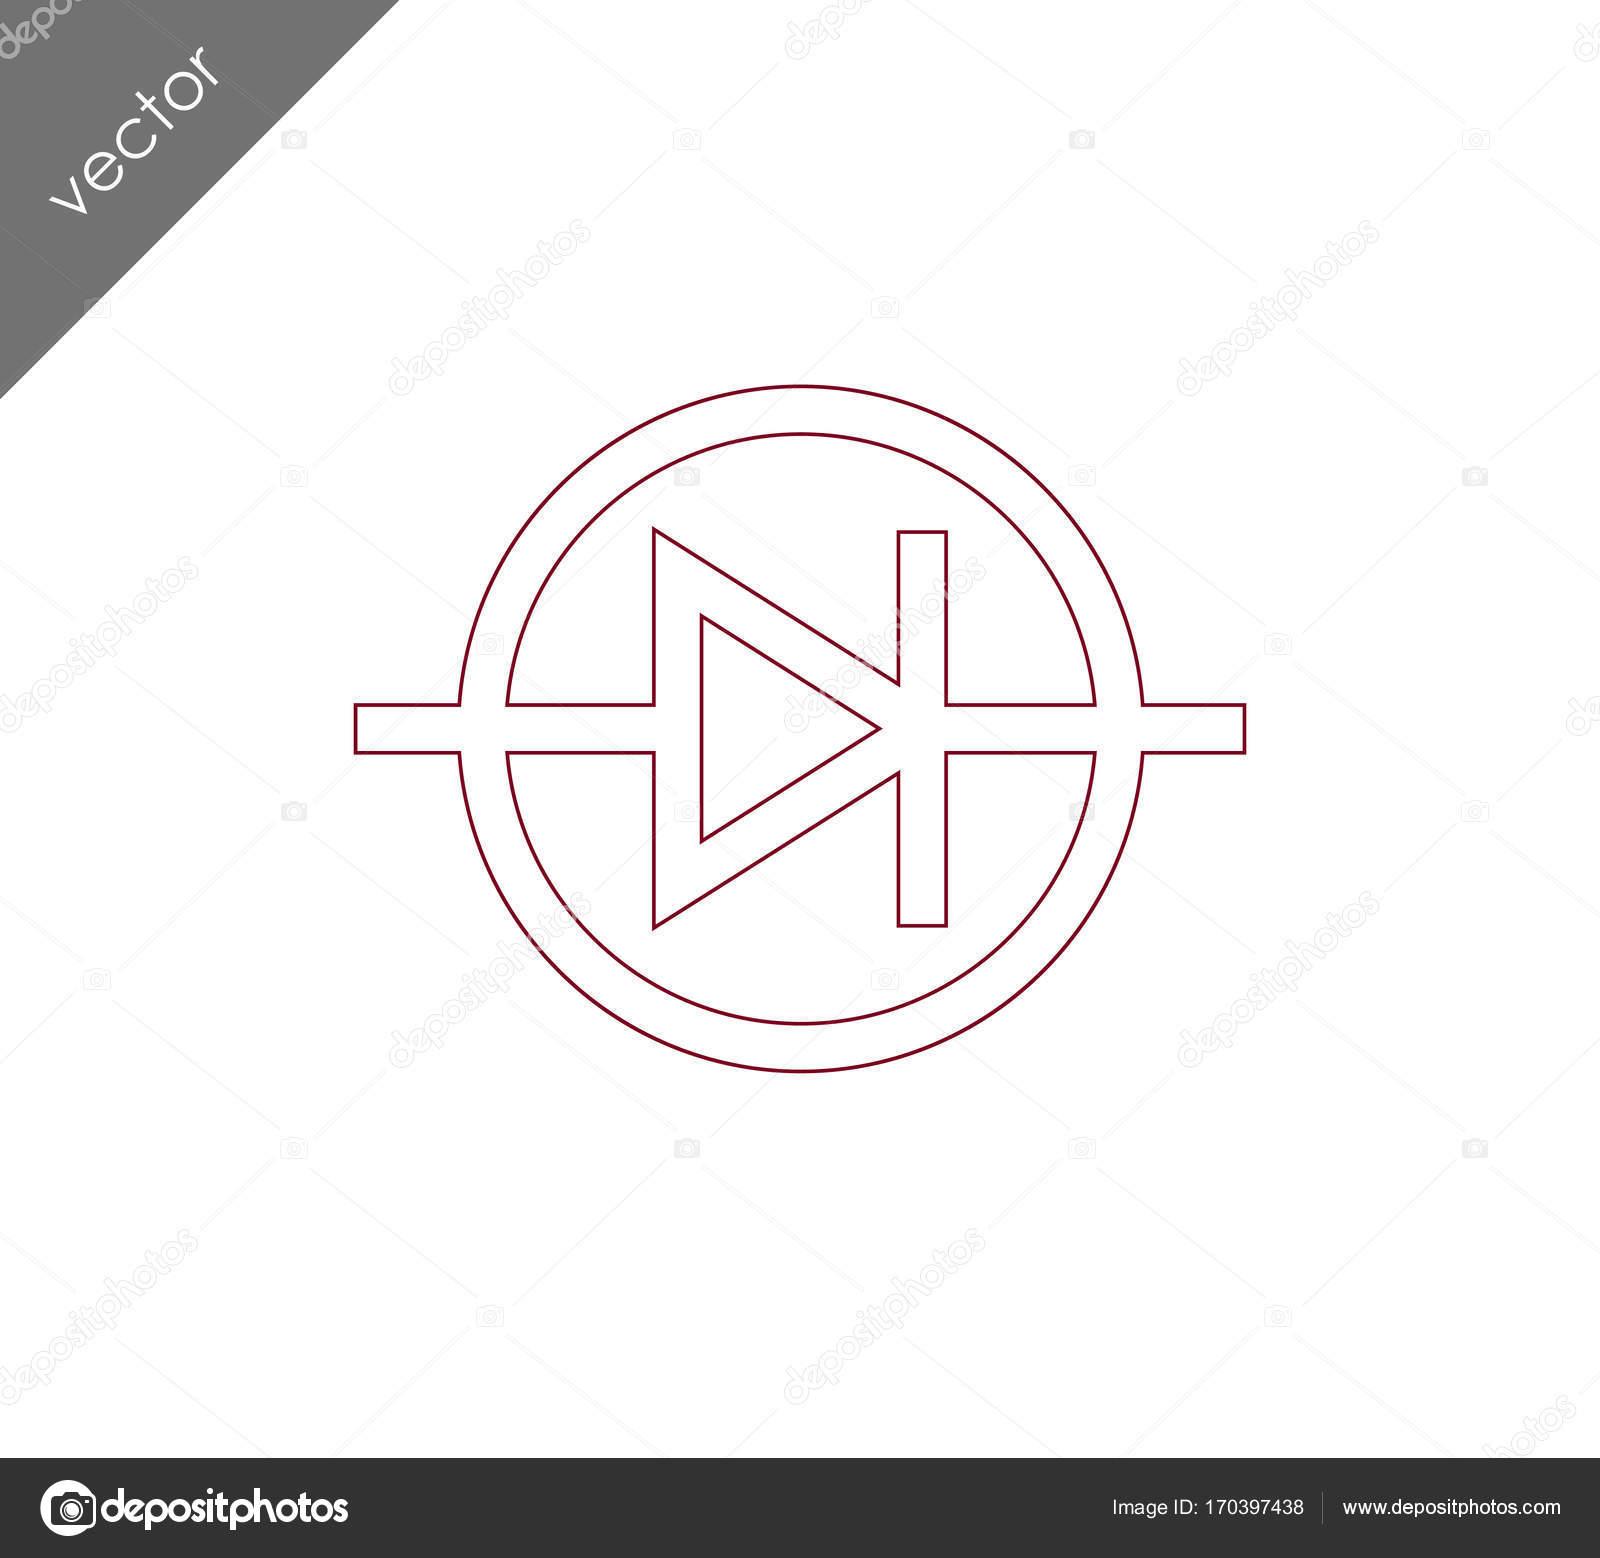 Diode elektrische Symbol Symbol — Stockvektor © signsandsymbols ...